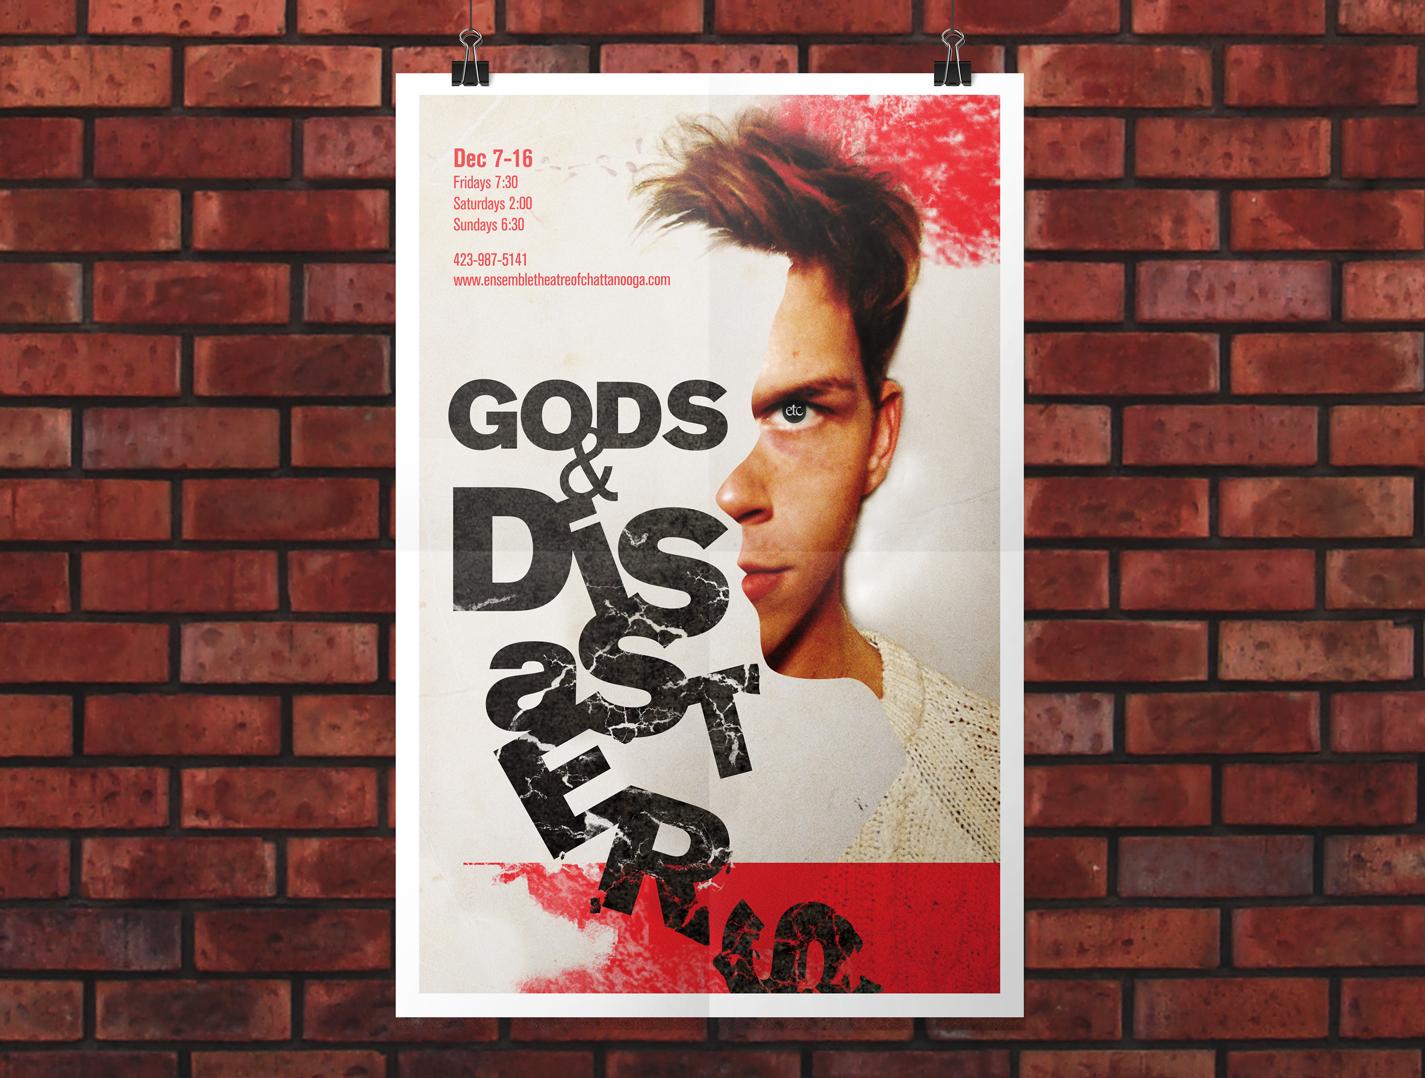 poster_mockup_Gods.jpg